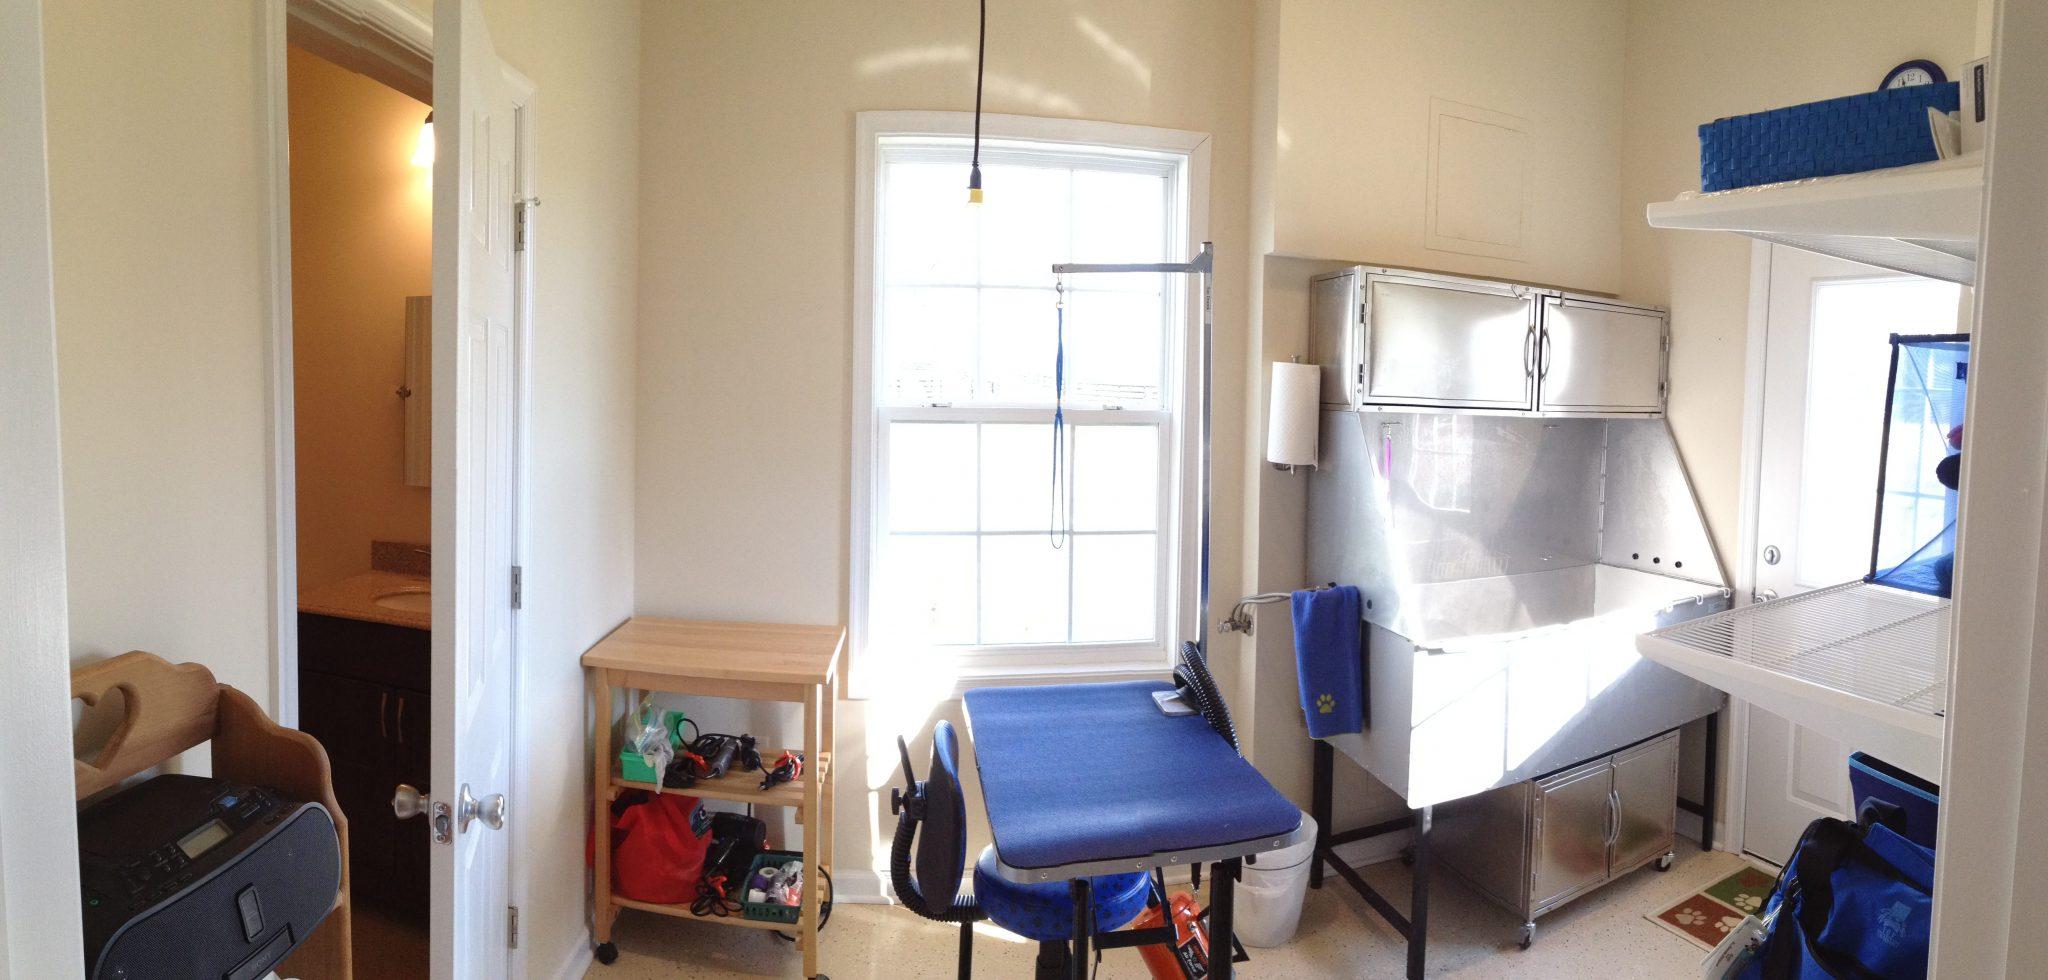 Award Winning In-Law Suite Garage work area